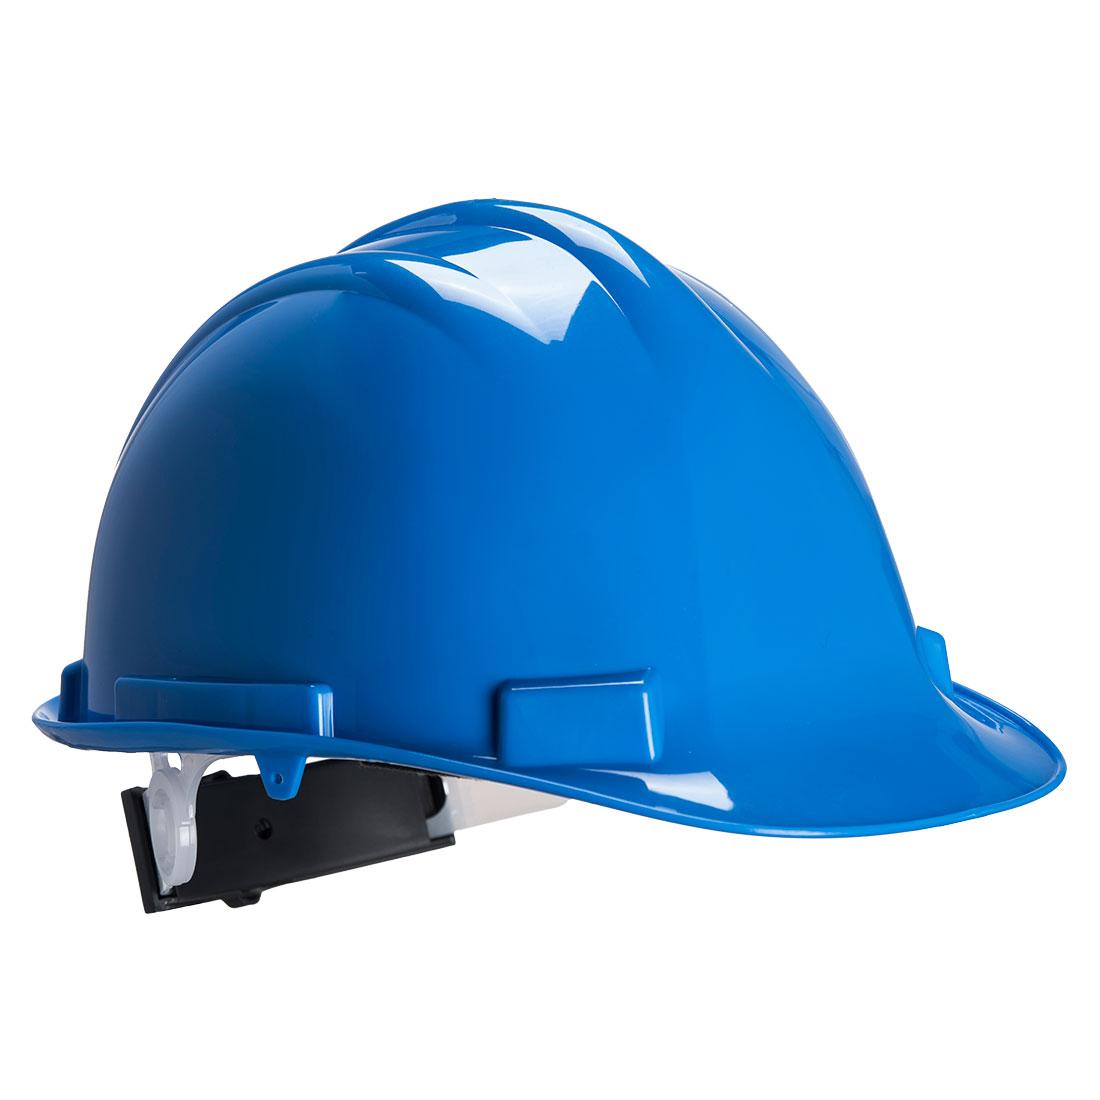 Expertbase Safety Helmet  PW50RBR